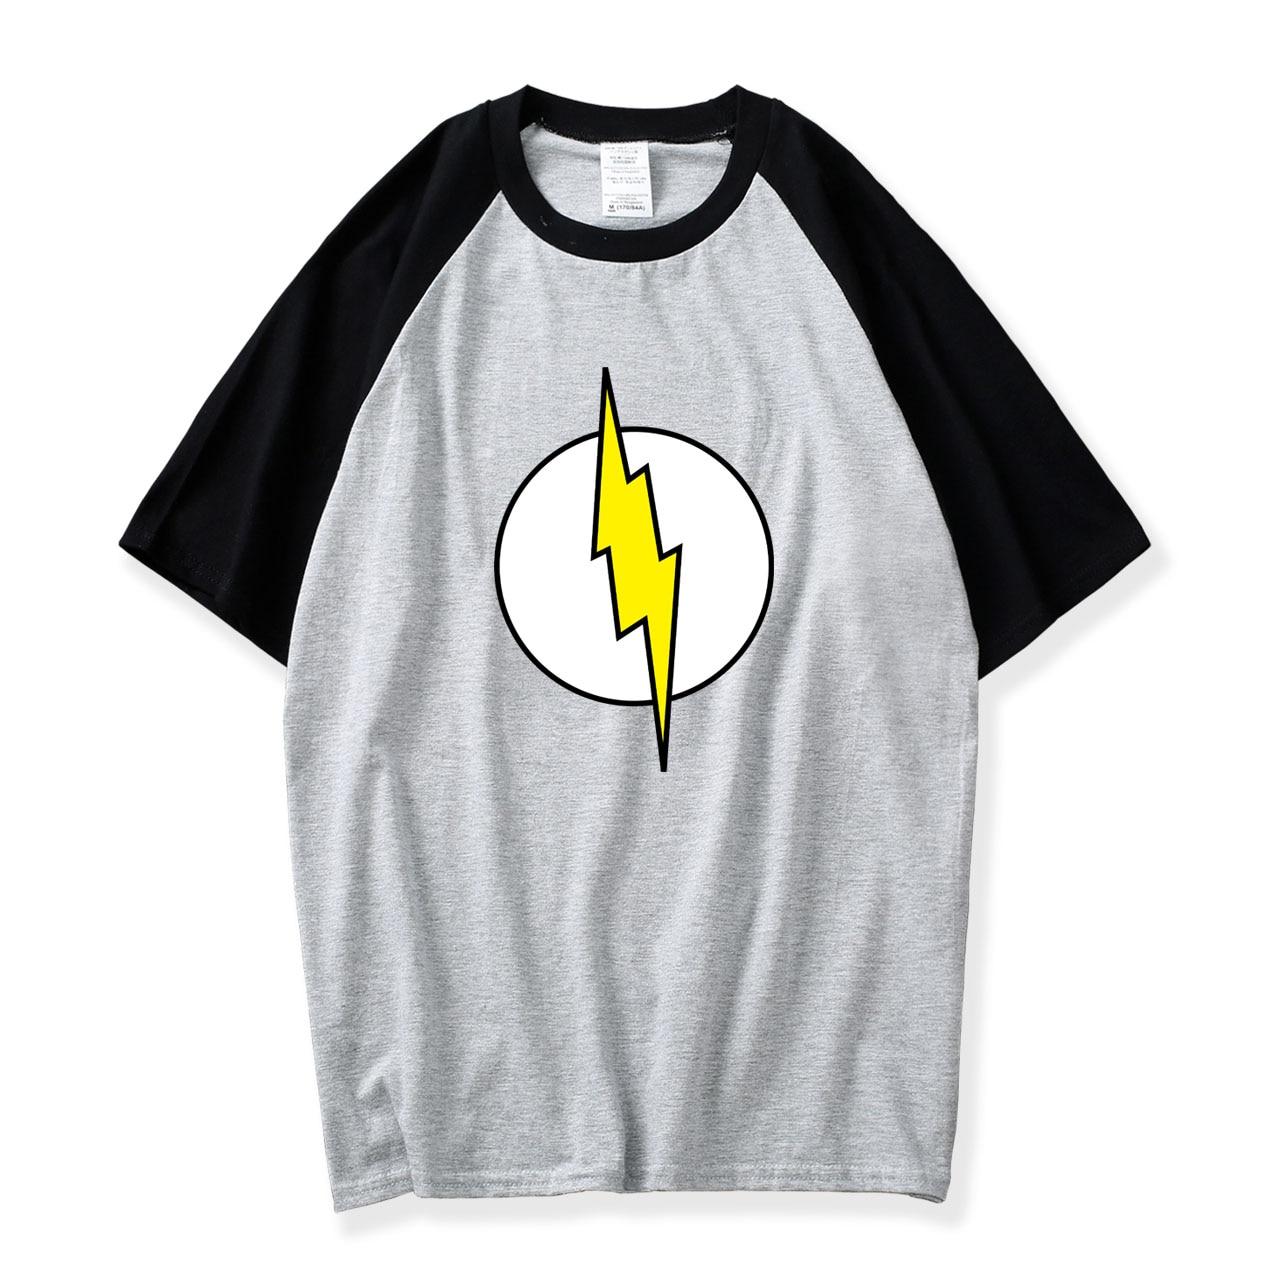 The Big Bang Theory T-shirt Sheldon Cooper Super Hero T Shirt Men Superman Raglan Tee TBBT Shirts 2018 Summer Cotton Loose Shirt